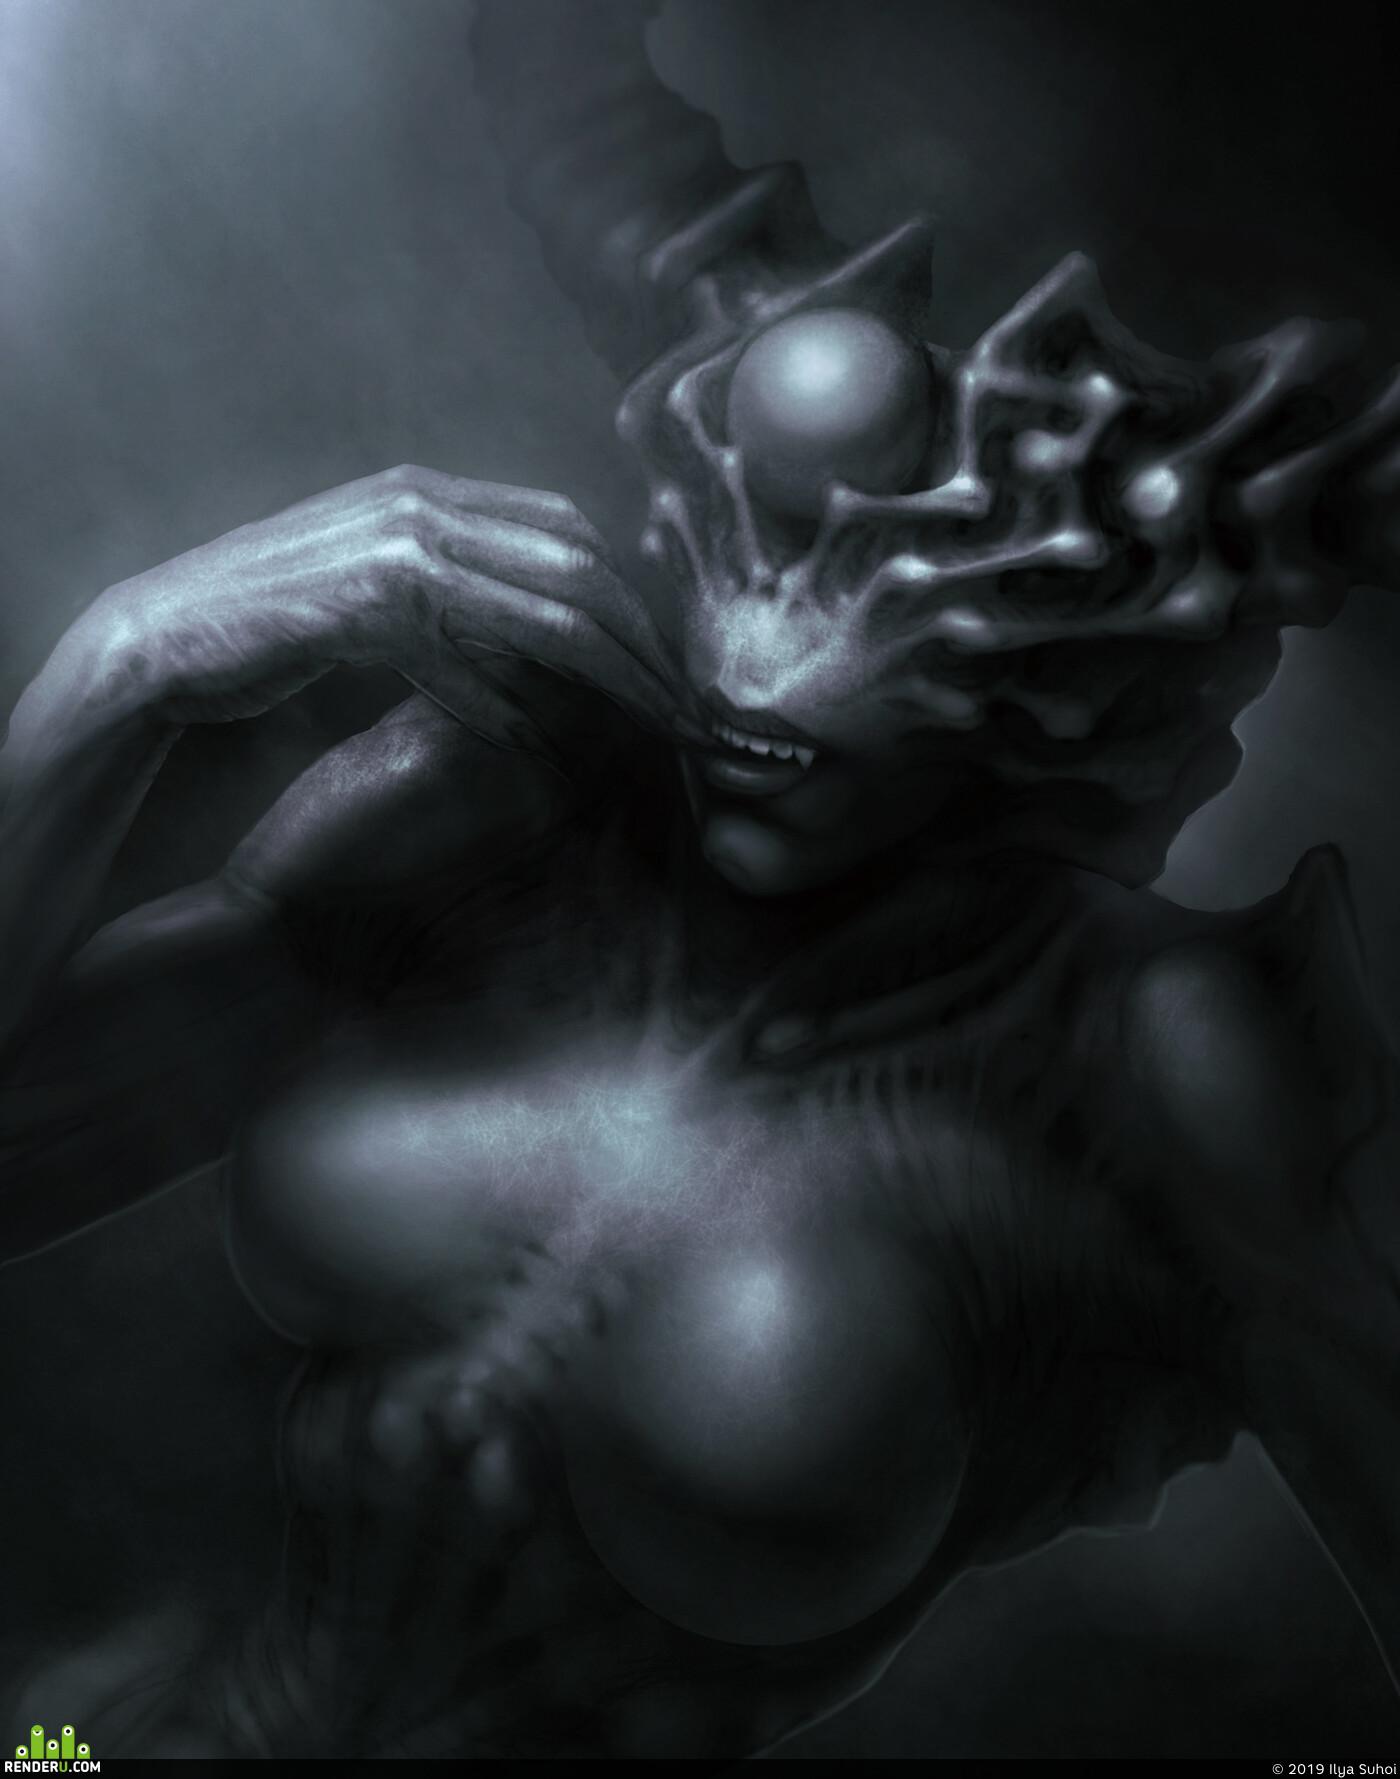 демон, Концепт-арт, Хоррор, фентези, 3D Эскизы